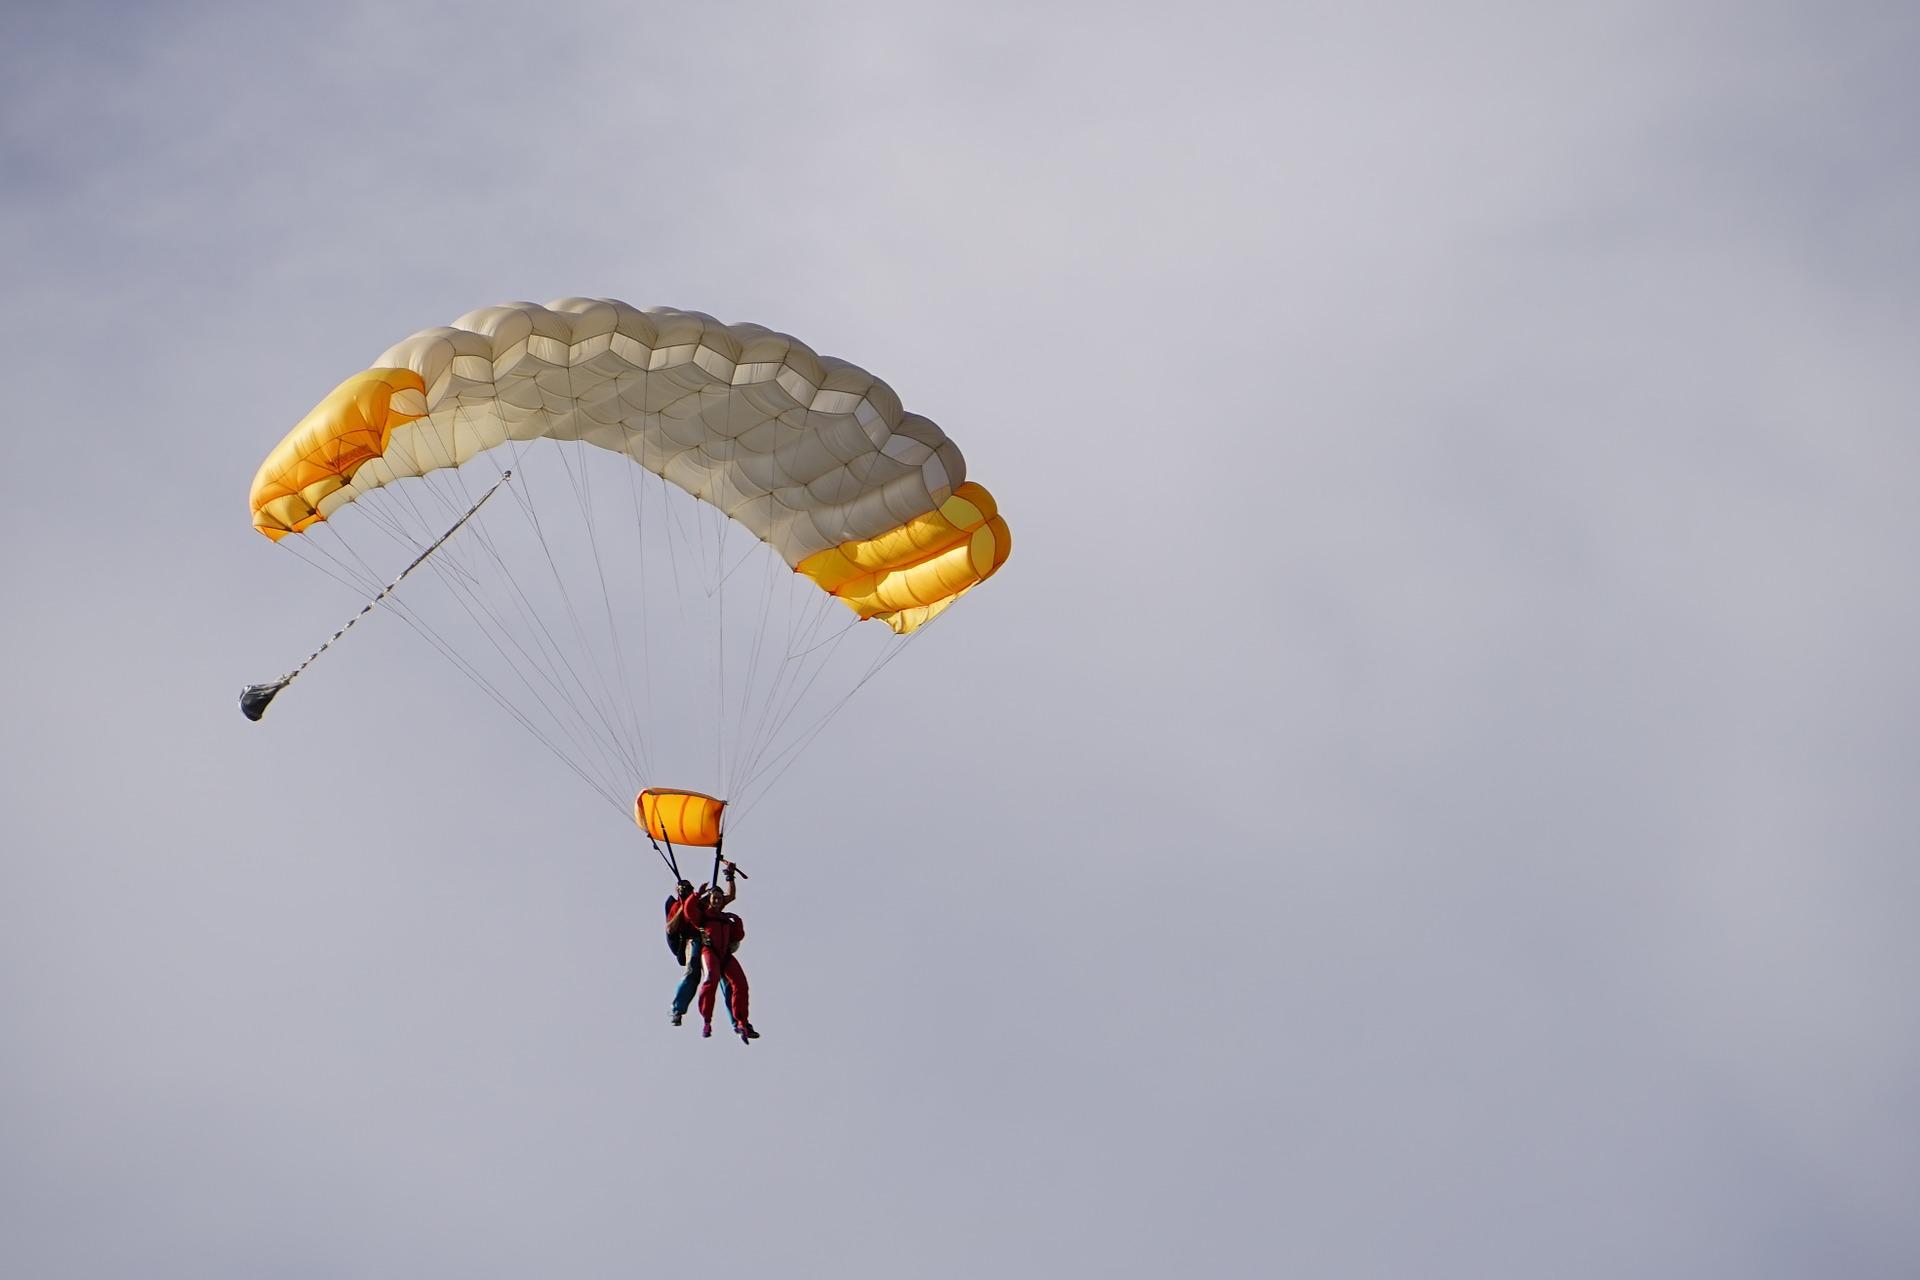 Fallschirm Tandemsprung im Saarland